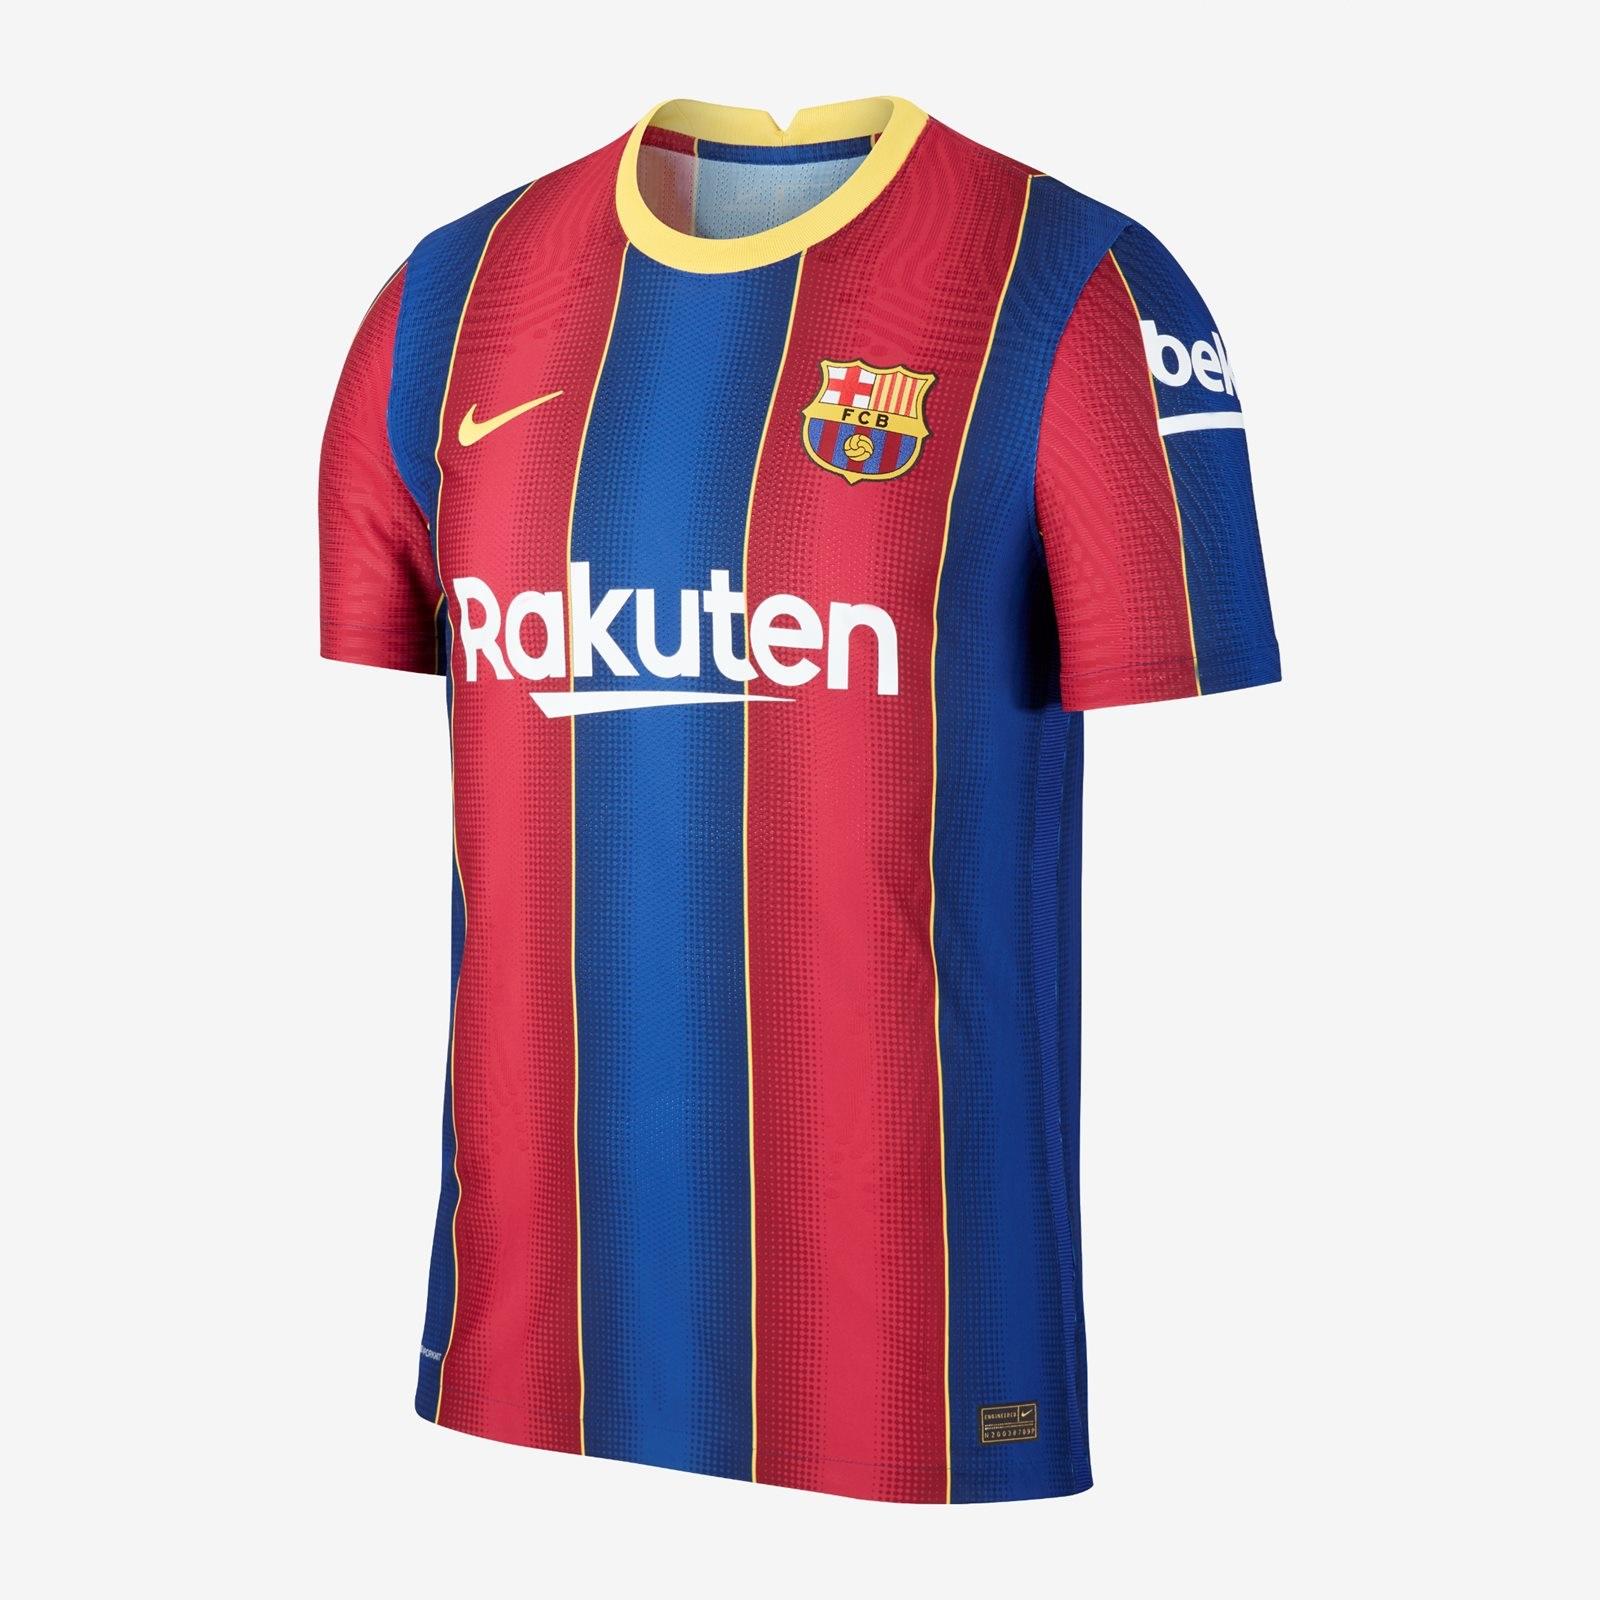 Domashnyaya Forma Barselony 20 21 Footykits Ru Vse O Futbolnoj Forme